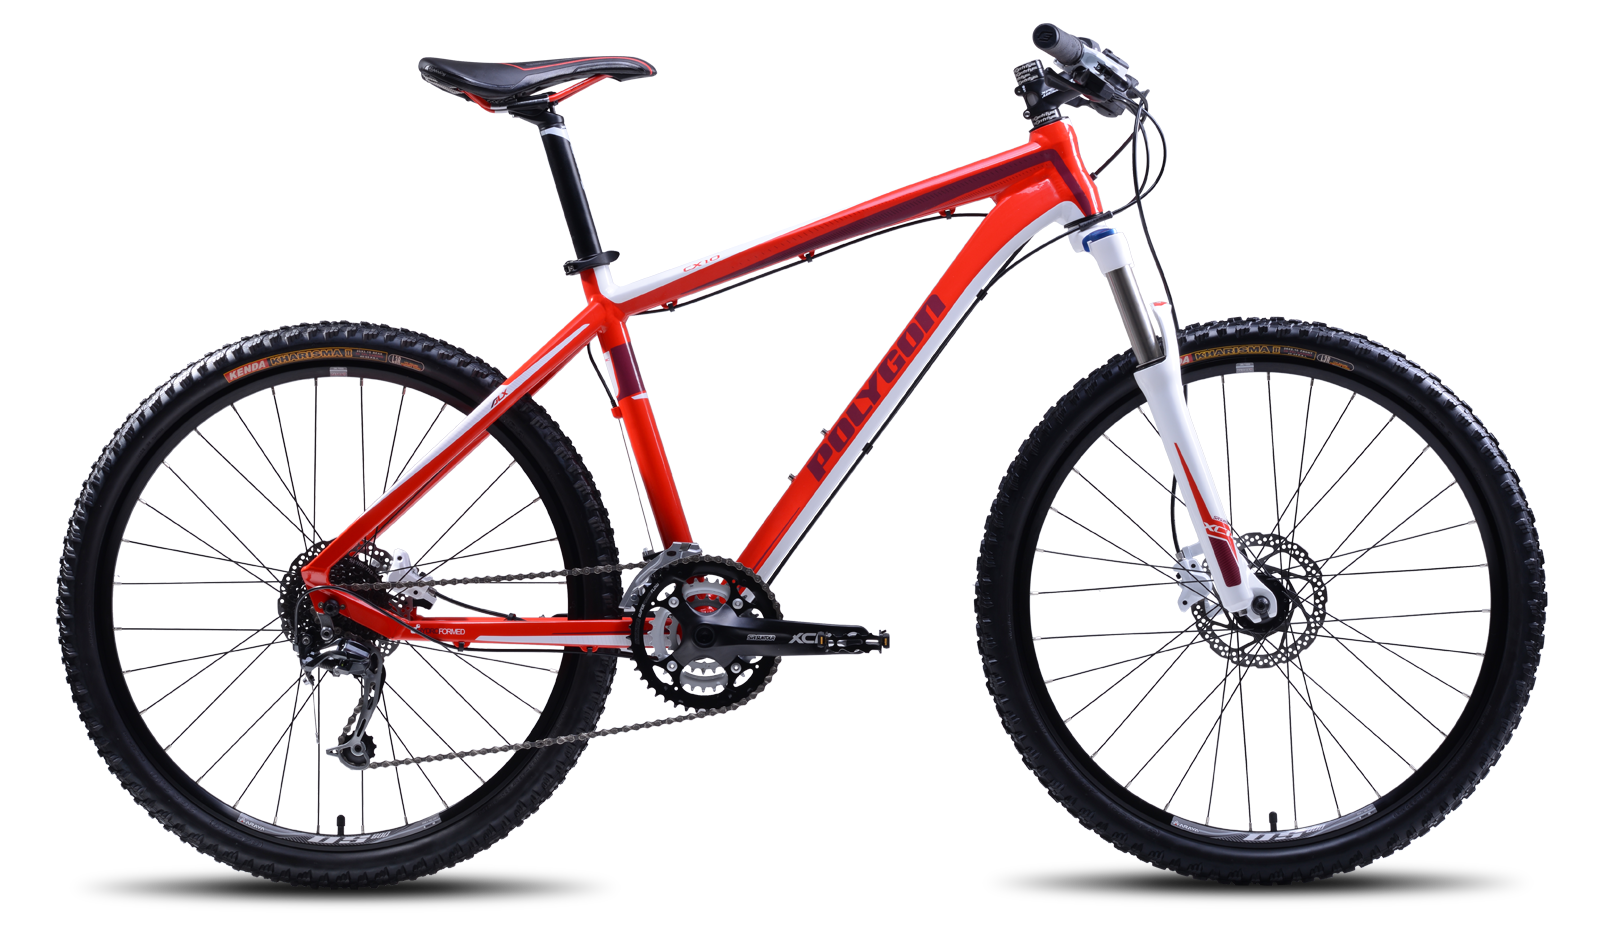 FIA BIKE: Sepeda Gunung Polygon COZMIC CX1.0 (Series 2013)